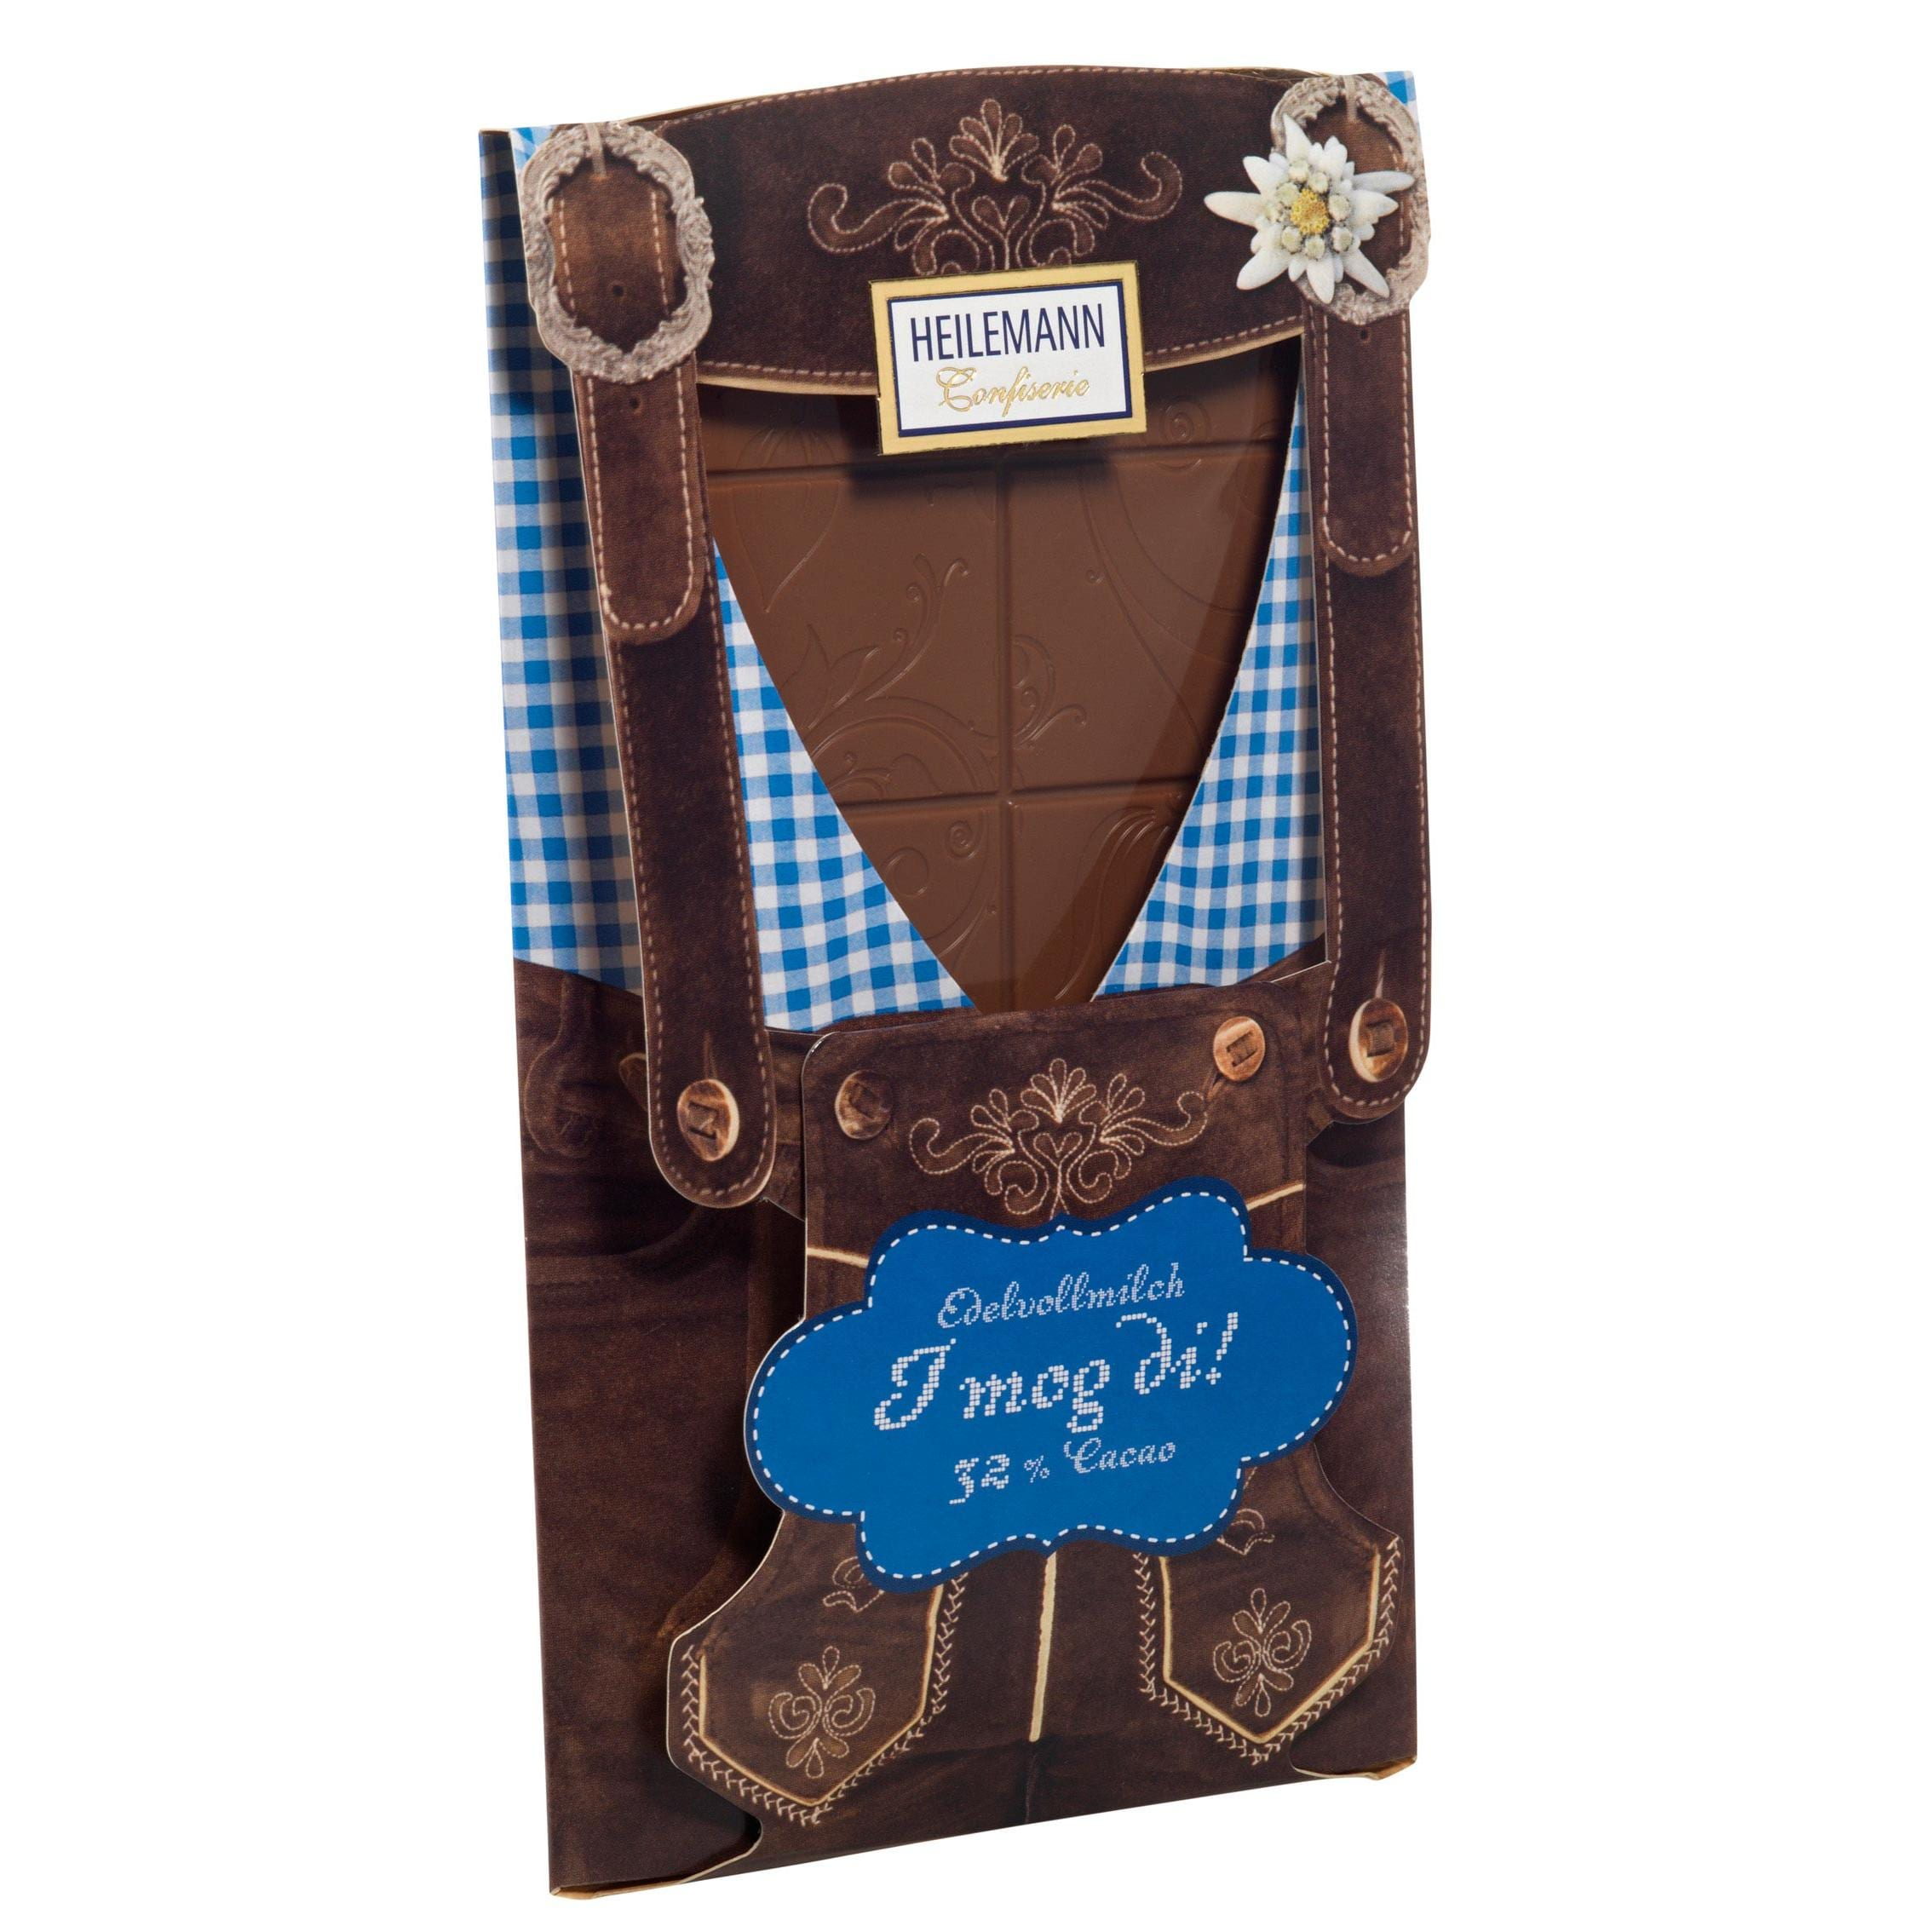 Heilemann - Tafel Lederhose Präsentschokolade - 37g